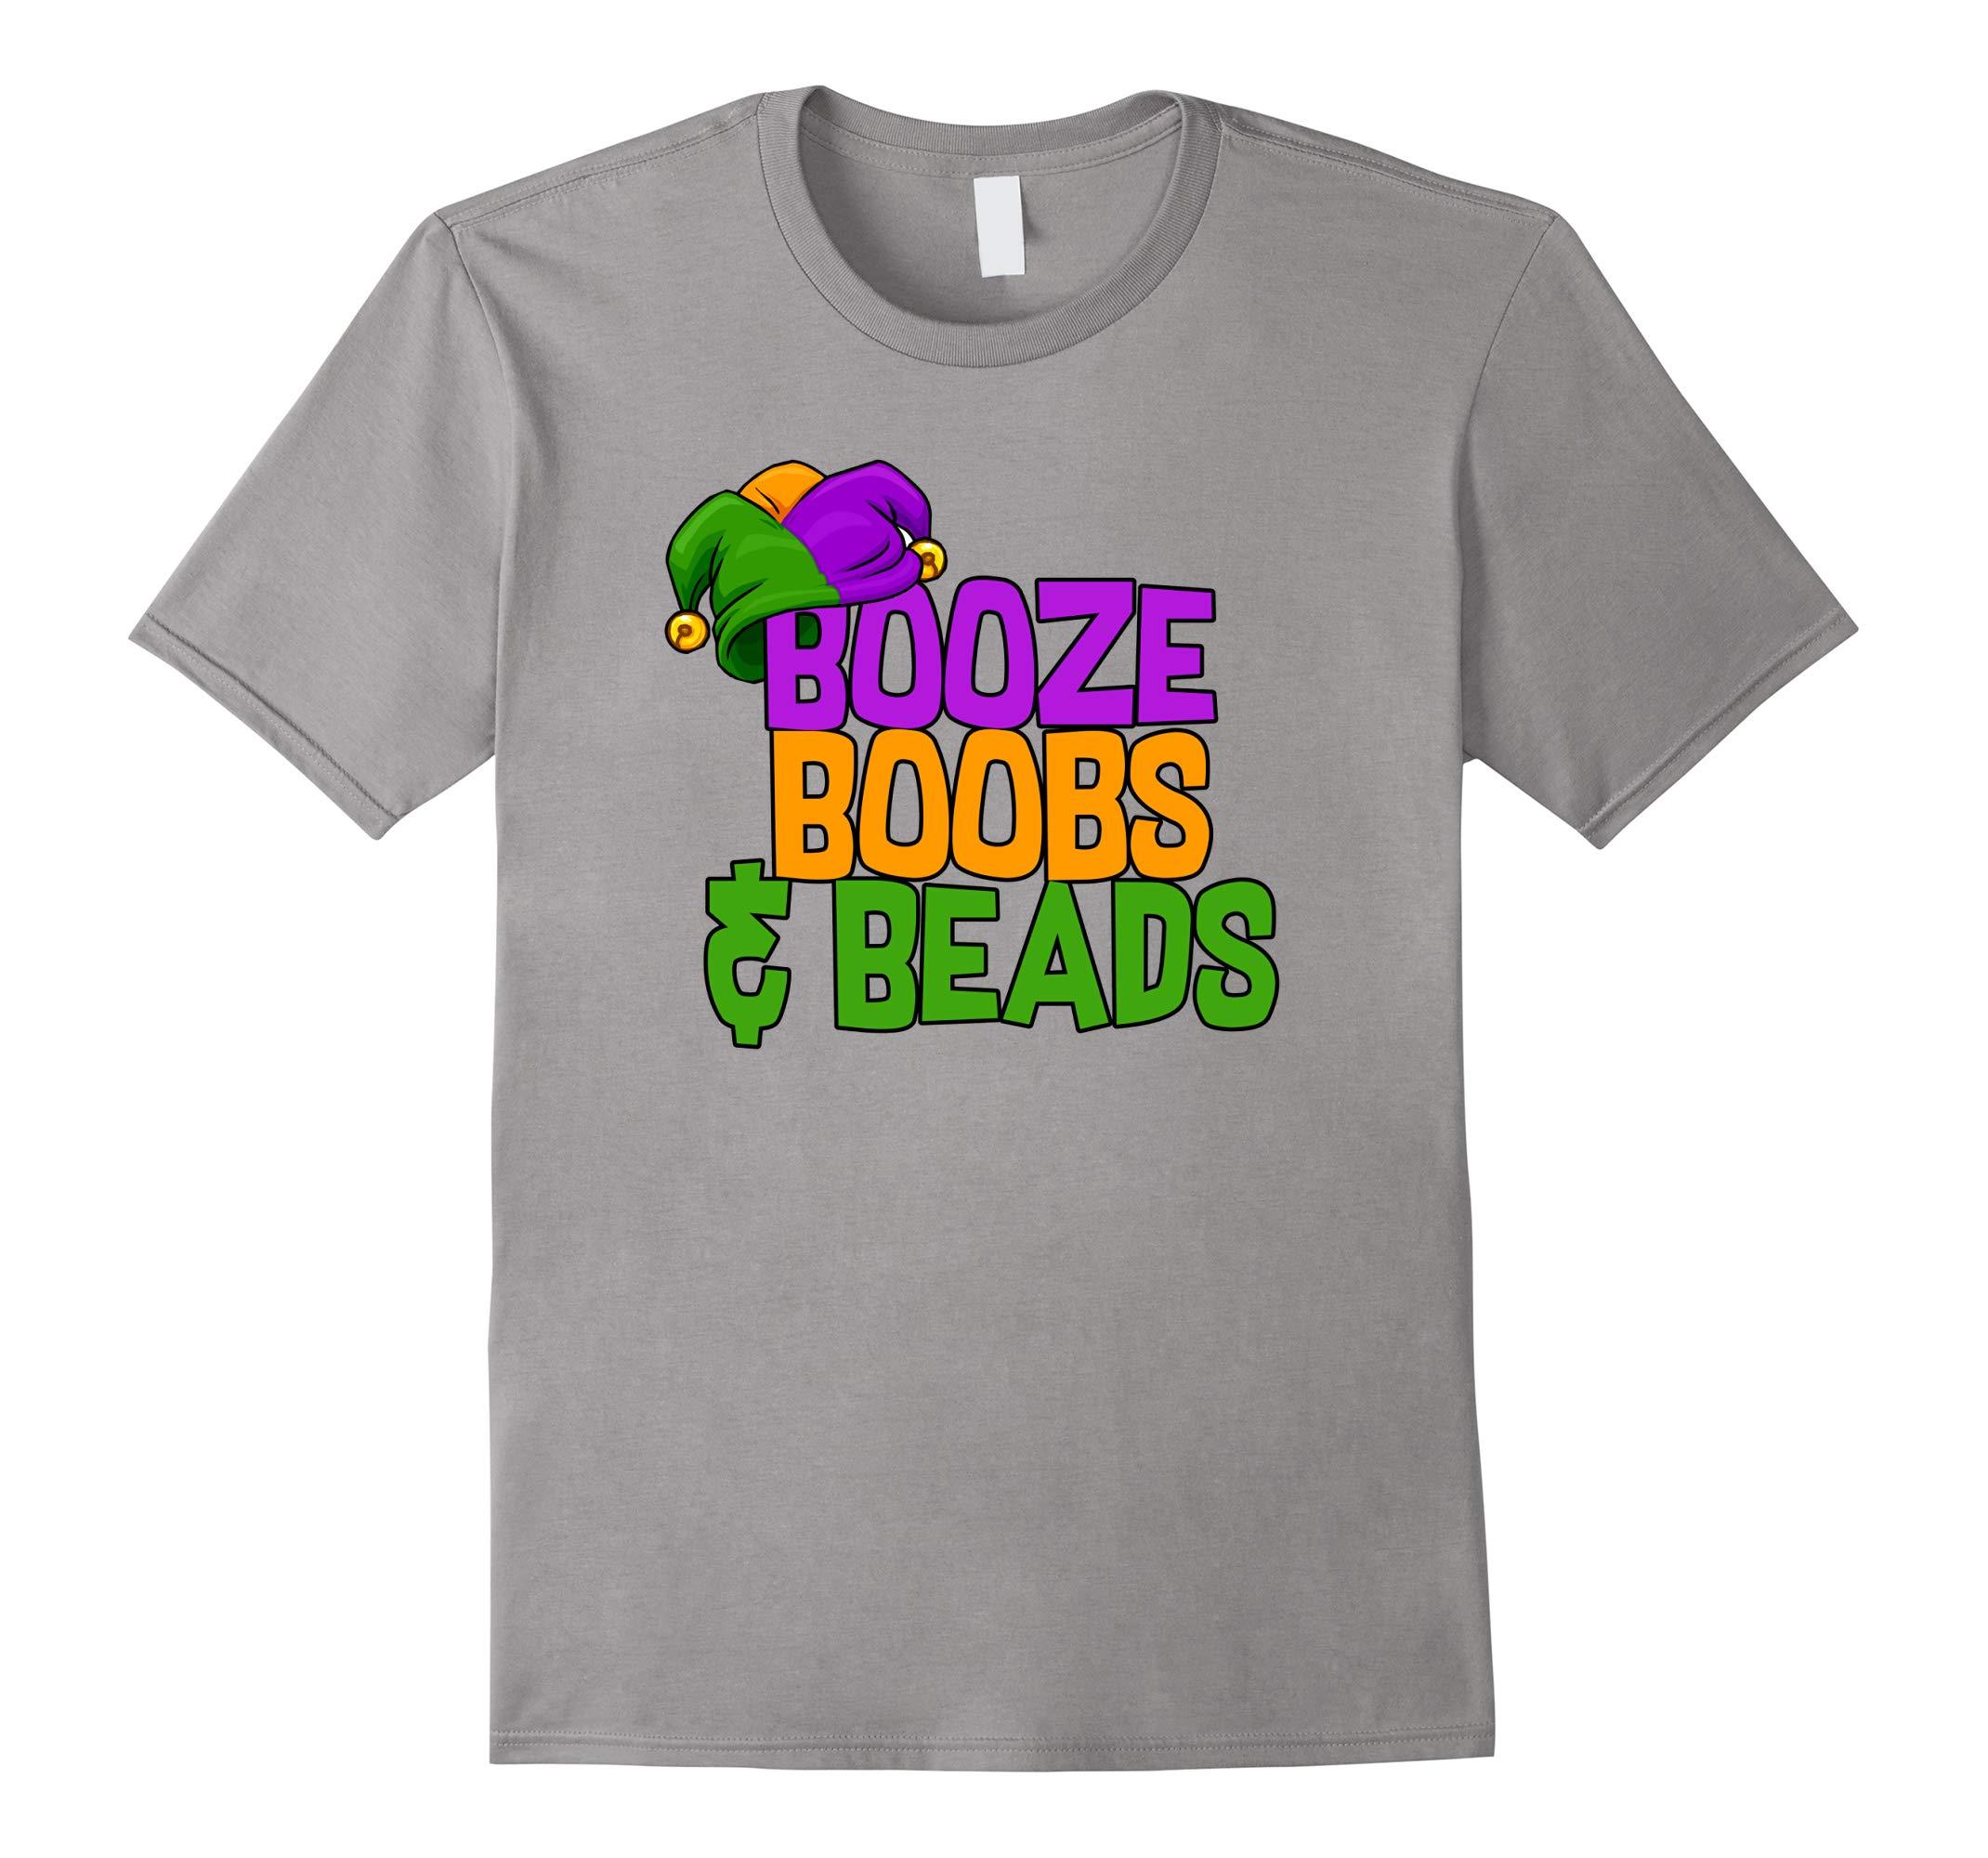 Booze, Boobs, and Beads - 2018 Mardi Gras T-Shirt-RT